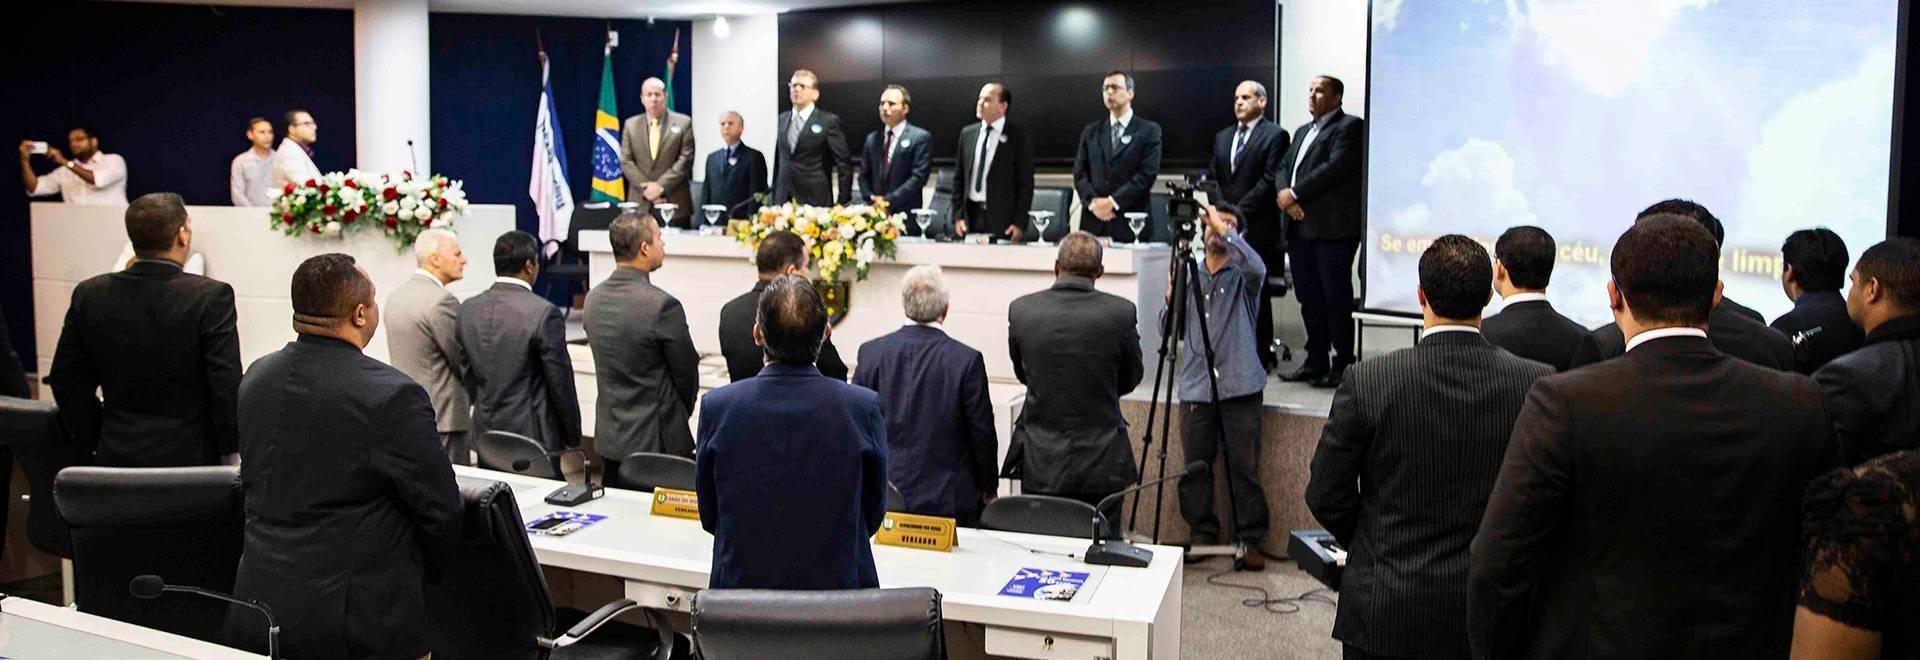 Poder Legislativo da Serra (ES) homenageia a Igreja Cristã Maranata